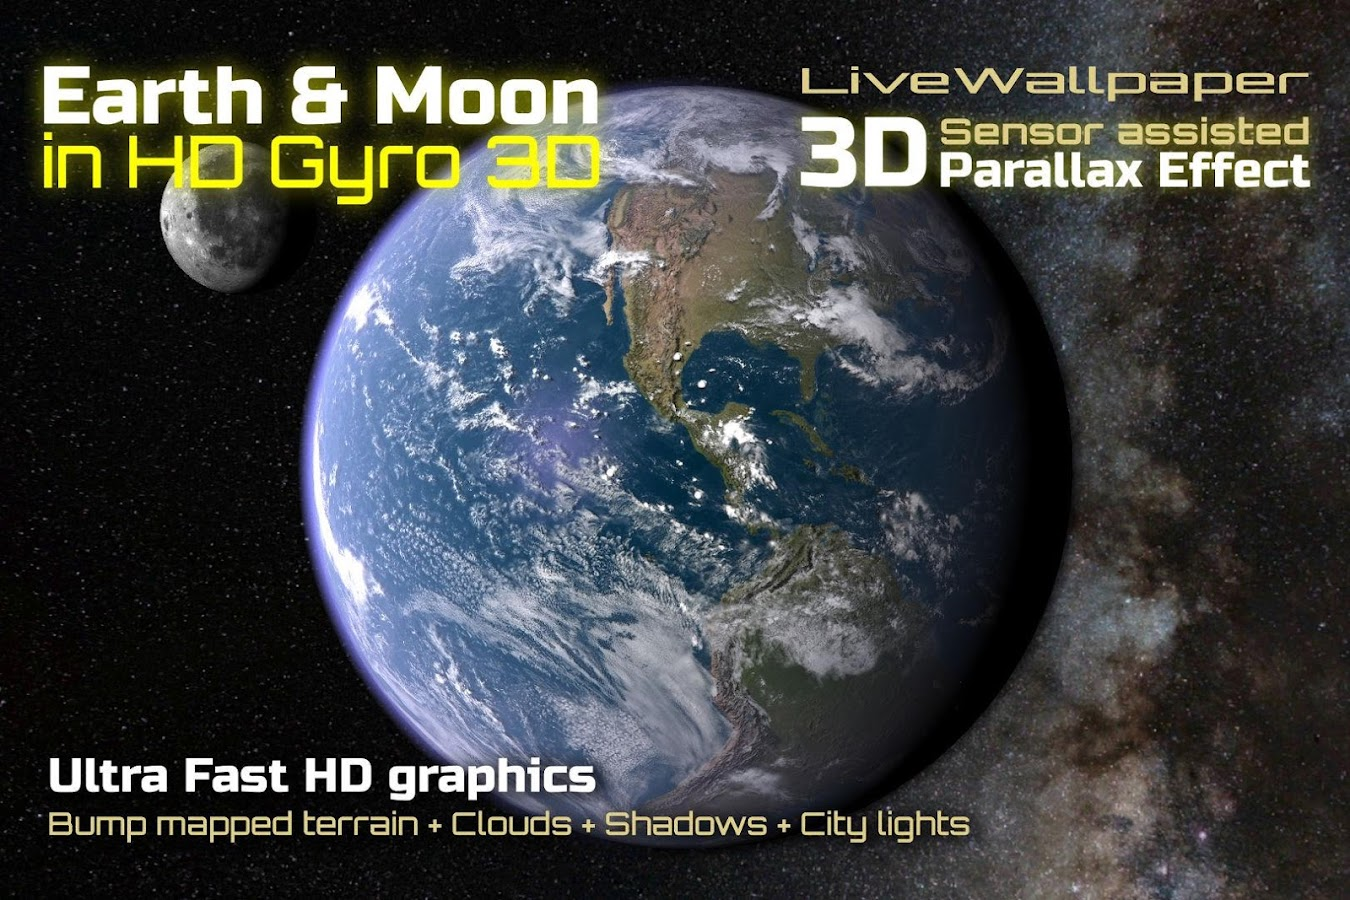 3d Wallpaper Gyro Earth Amp Moon In Hd Gyro 3d Parallax Live Wallpaper